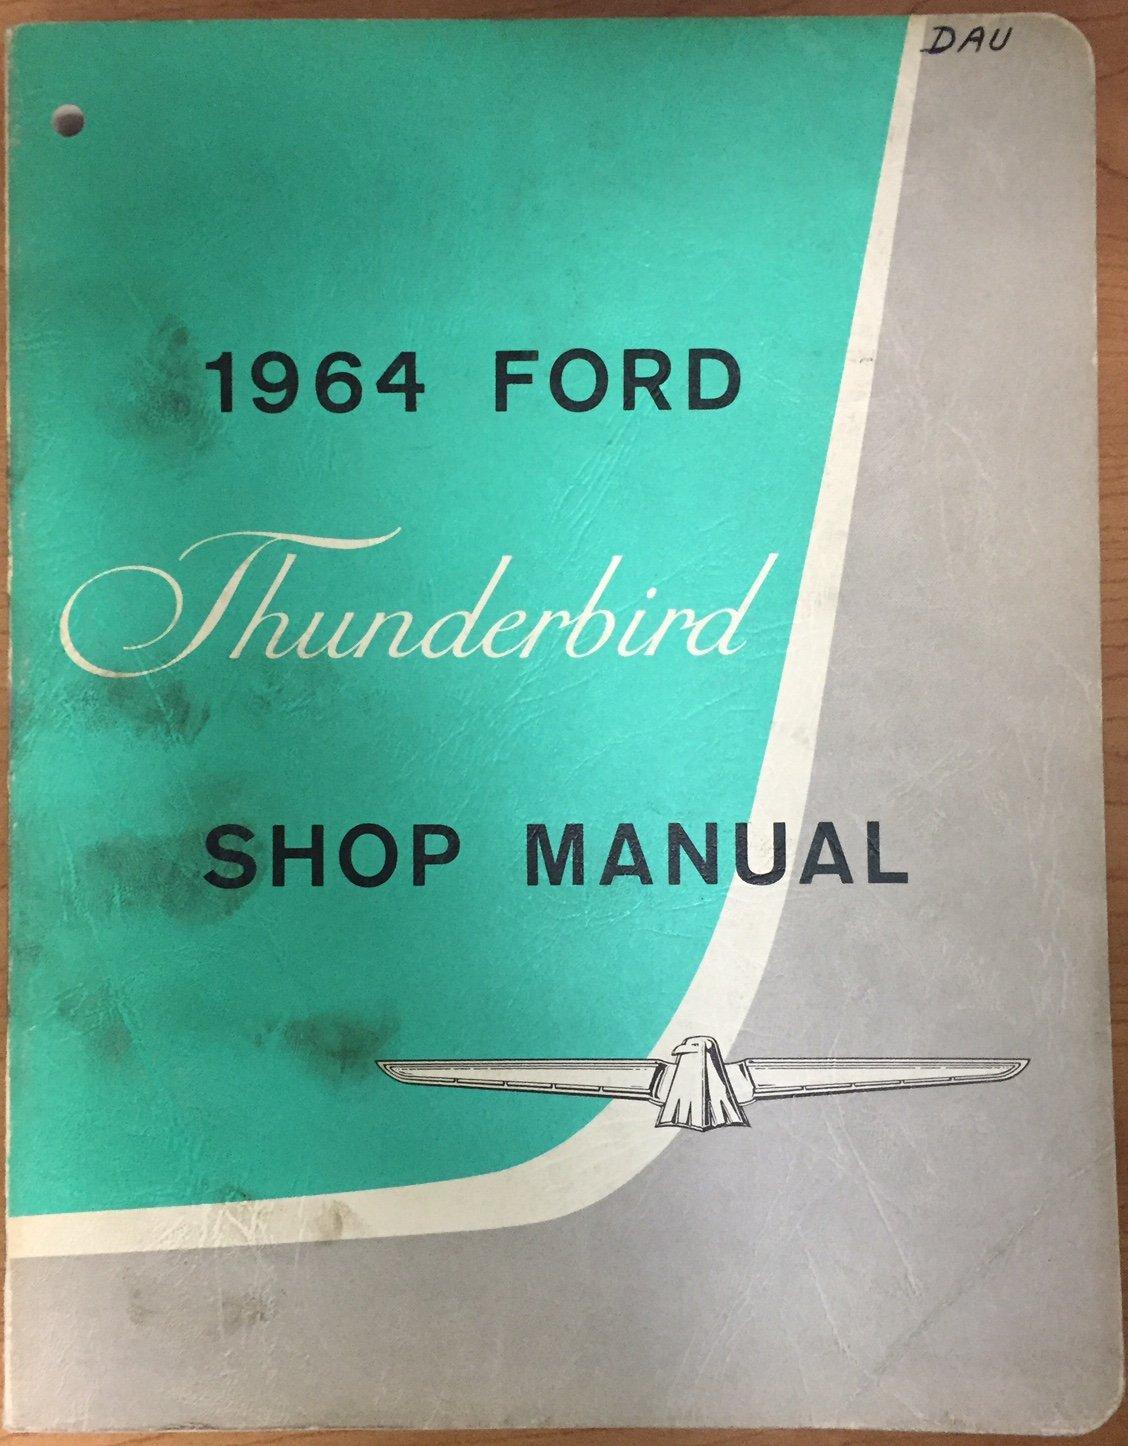 1964 Ford Thunderbird Repair Shop Manual Original: Ford: Amazon.com: Books